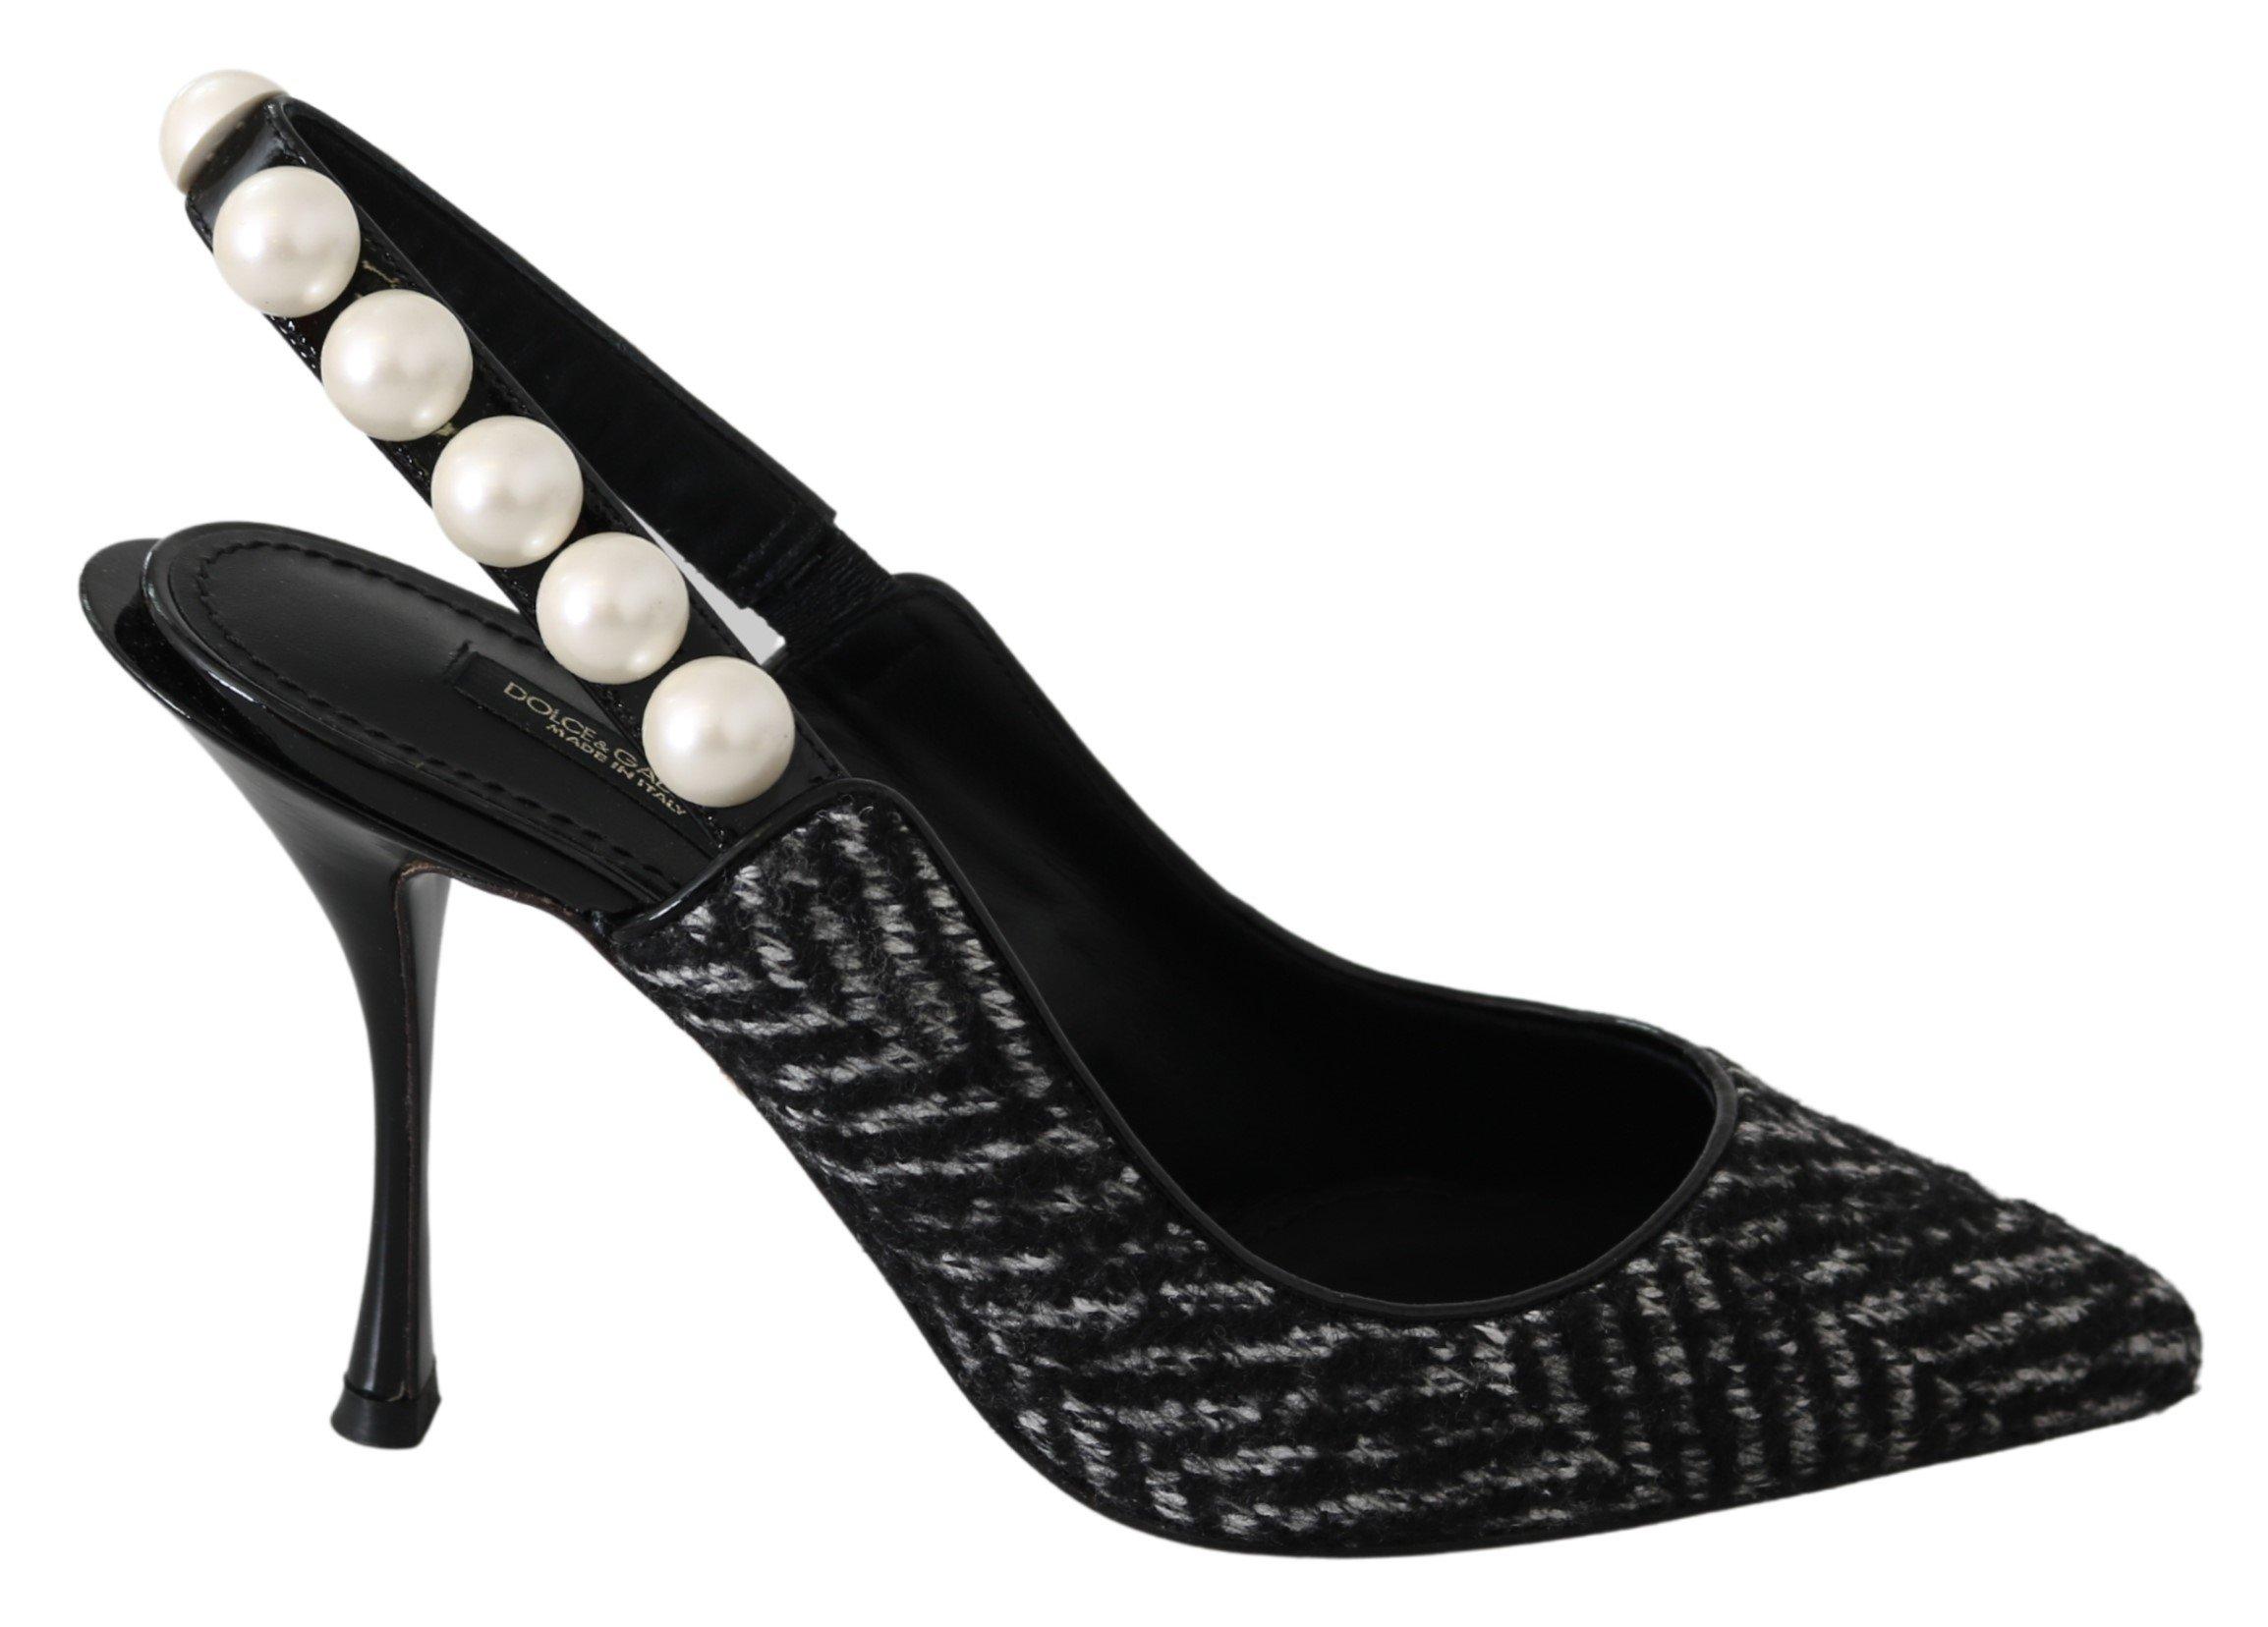 Dolce & Gabbana Women's Chevron Pearls Slingback Black LA7660-37 - EU37/US6.5